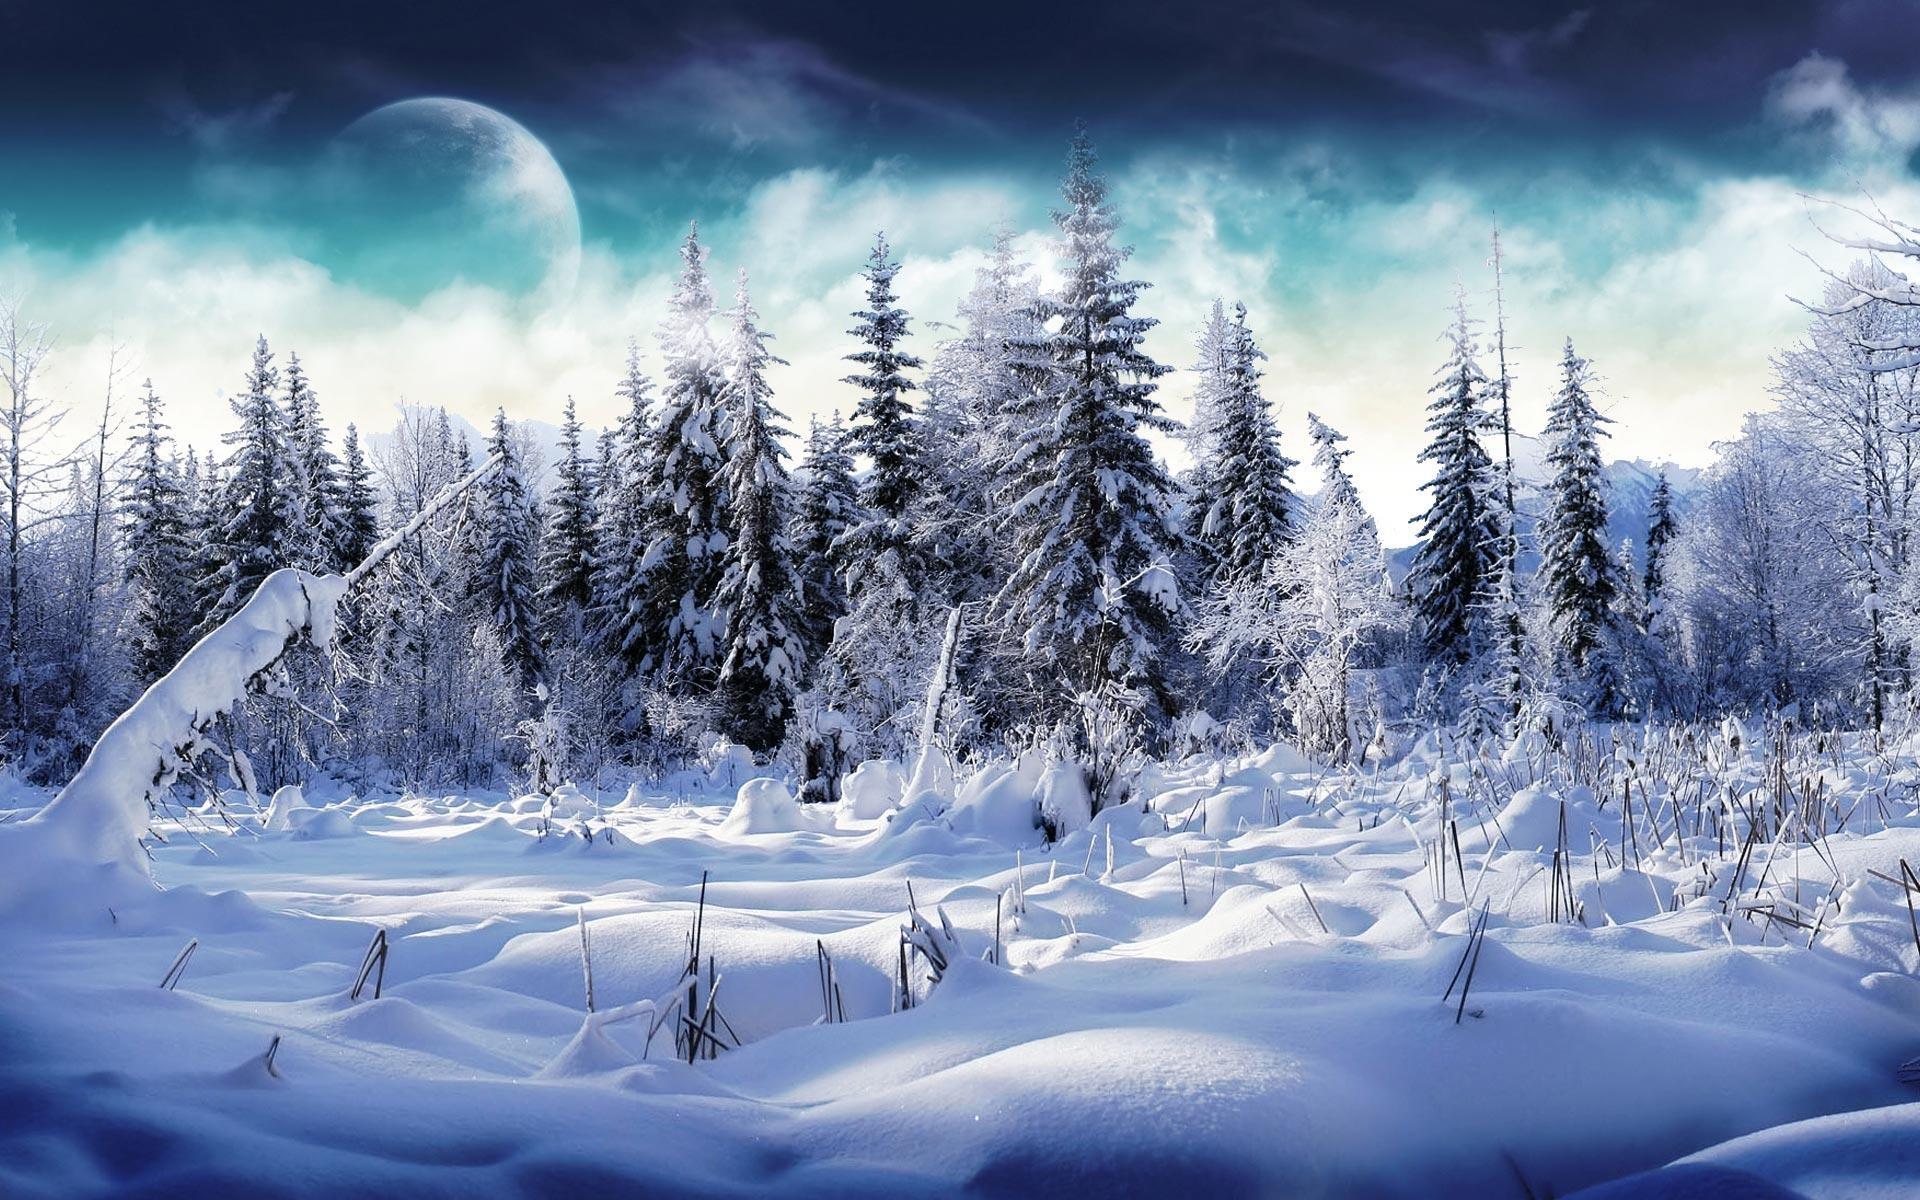 Desktop Wallpaper · Gallery · Nature · Winter Snowy forest   Free .